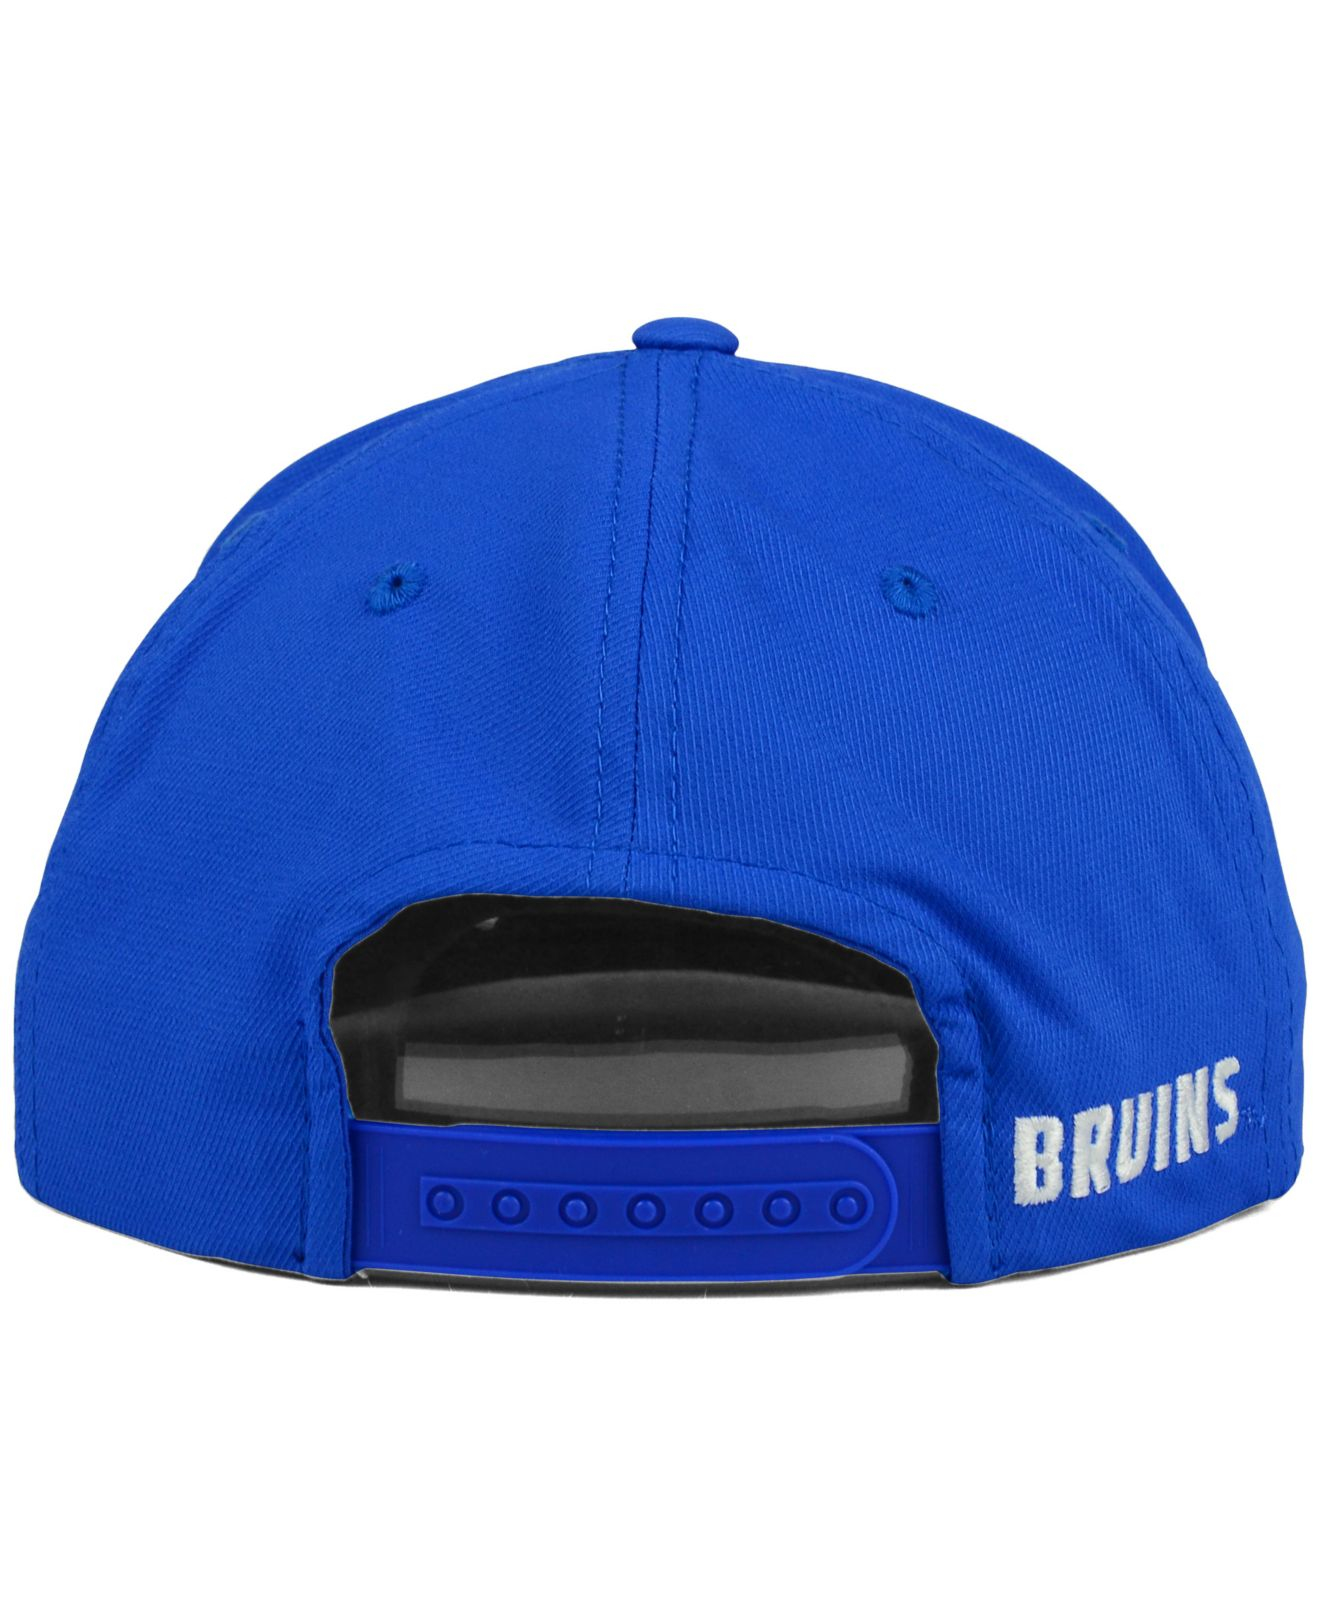 40505fa3487 Adidas originals Ucla Bruins Flat Brim Snapback Cap in Blue for Men